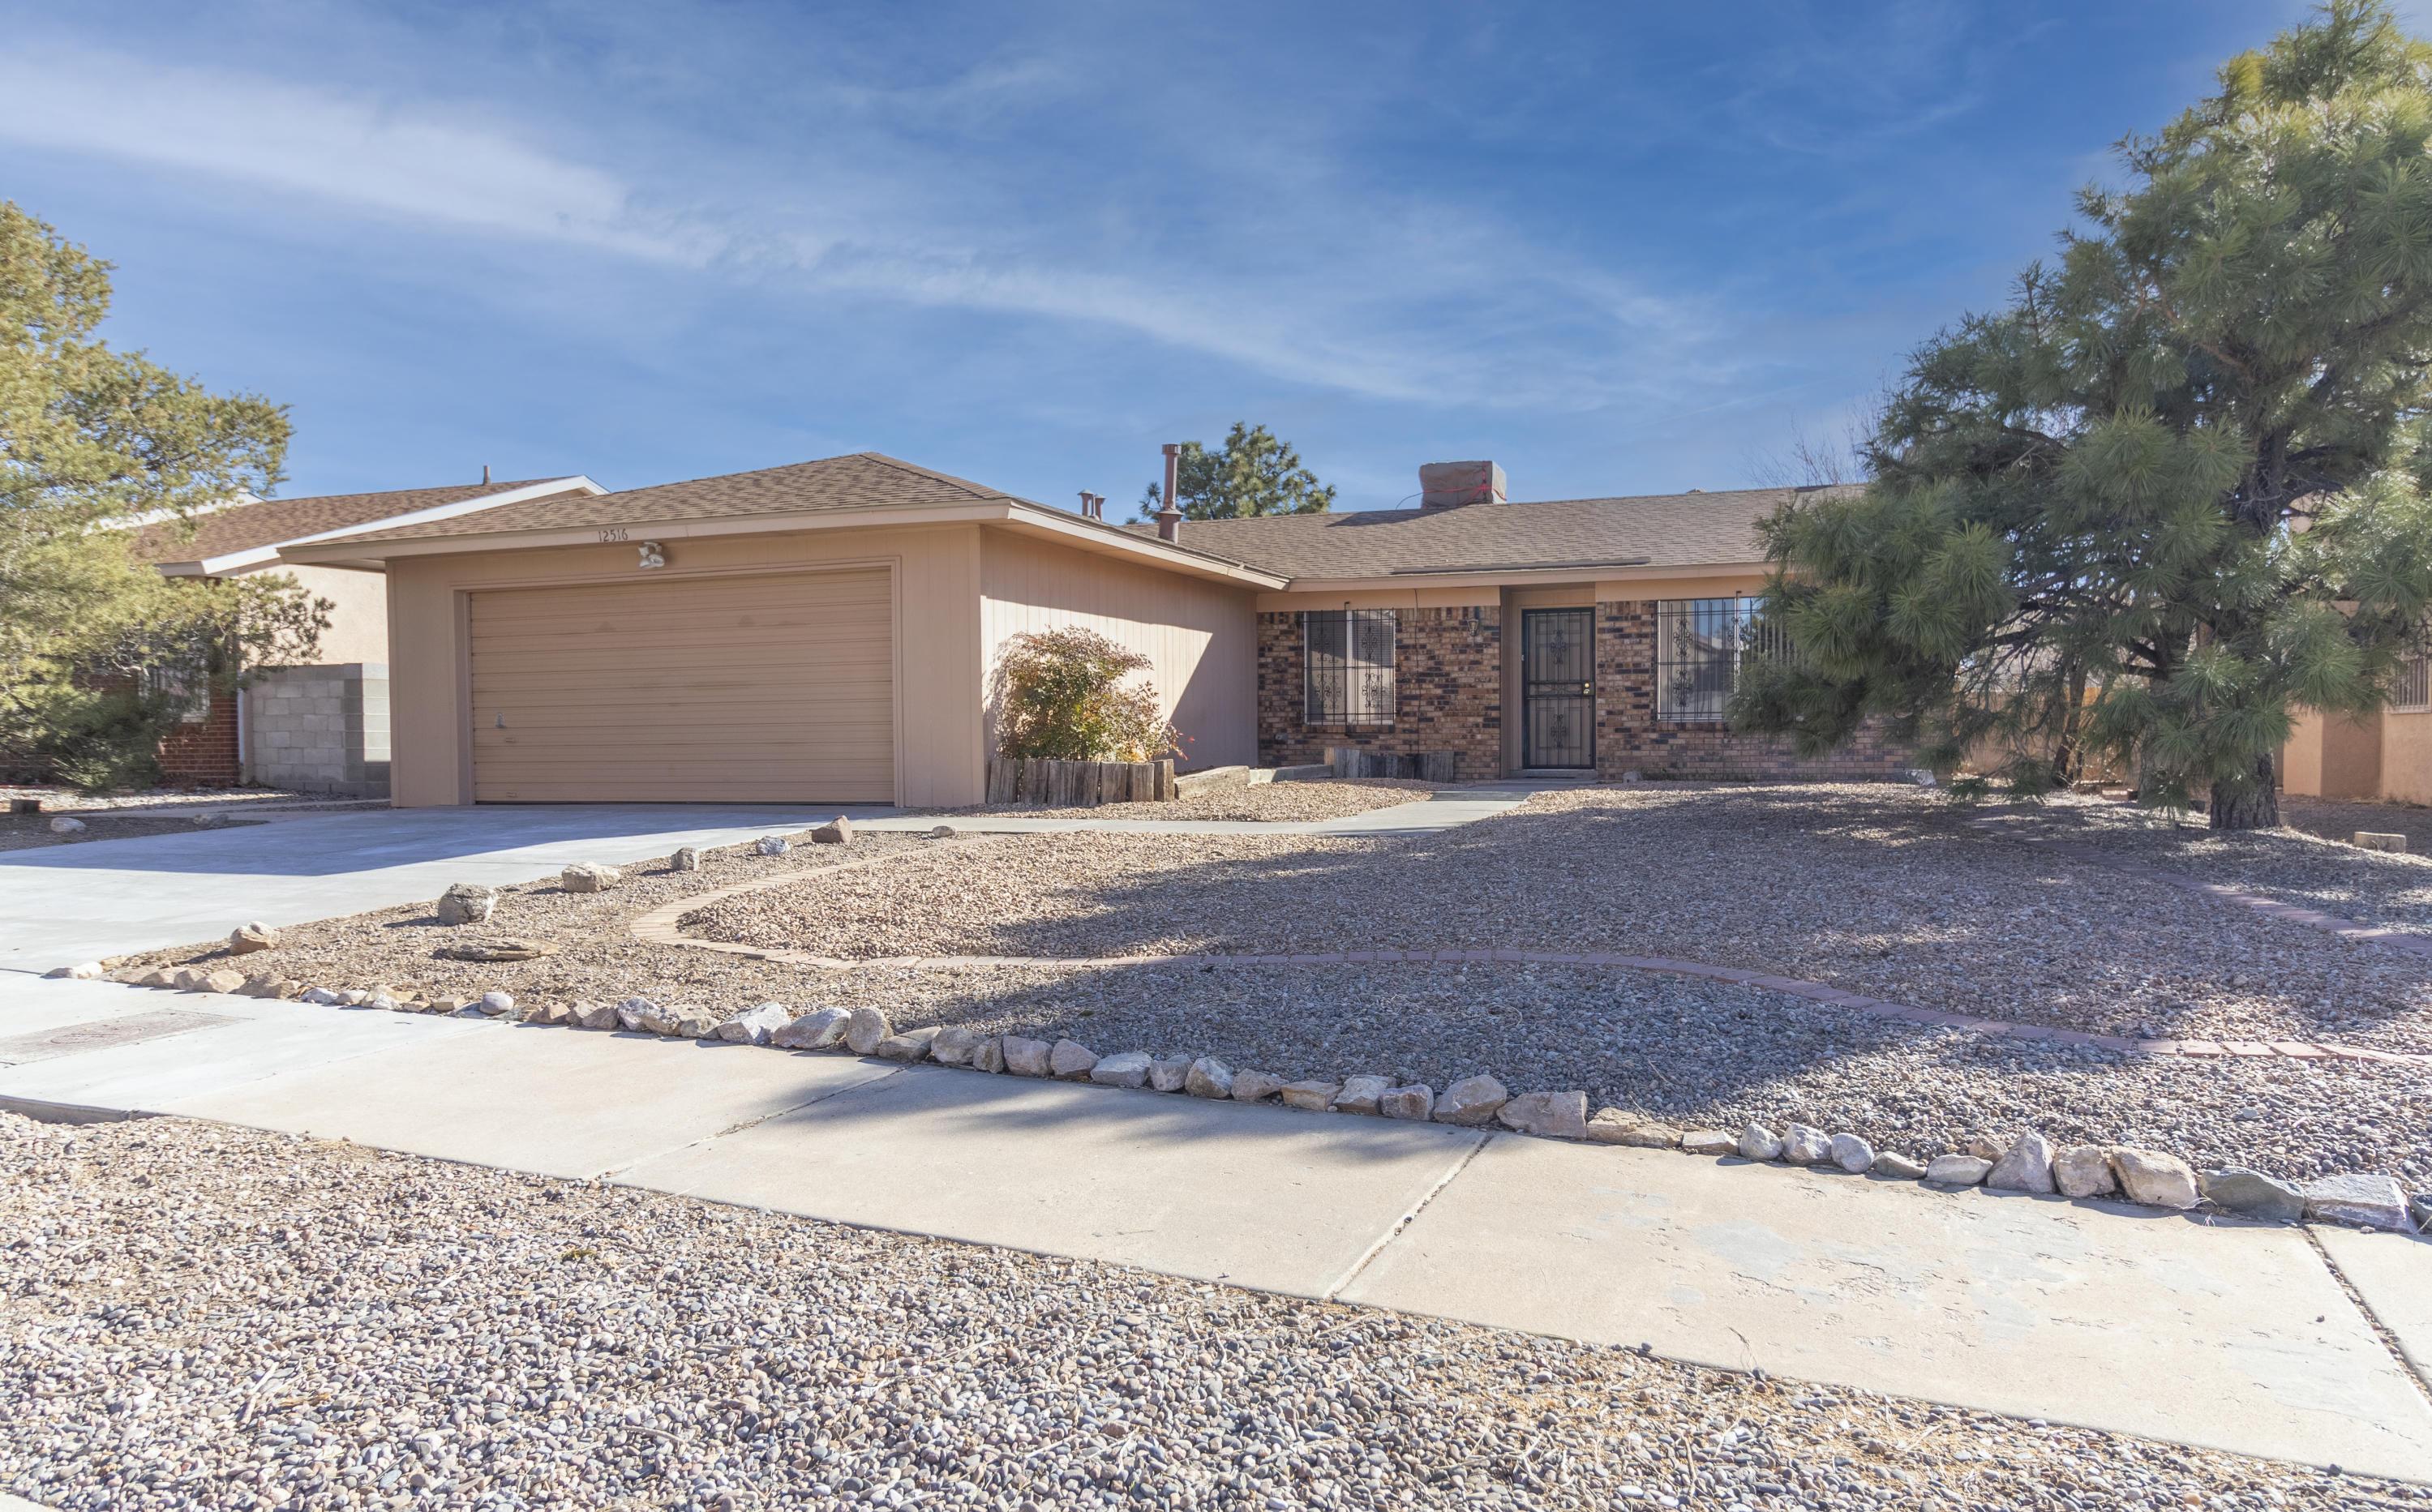 12516 YORBA LINDA Drive SE Property Photo - Albuquerque, NM real estate listing